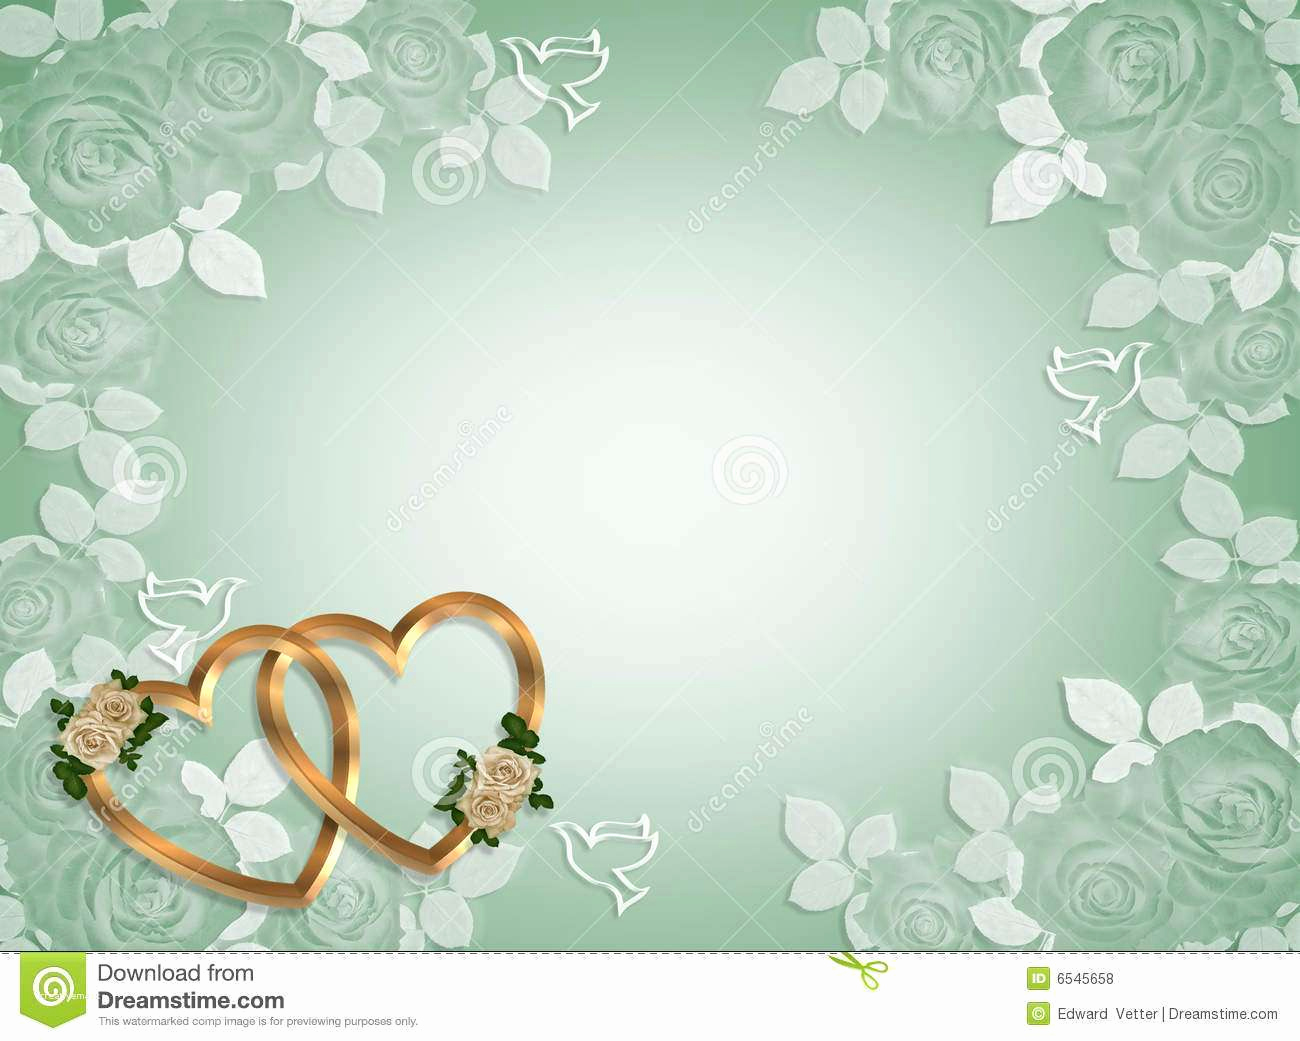 Free Wedding Invitation Templates Download Fresh Wedding Invitation Background Designs Free Luxury